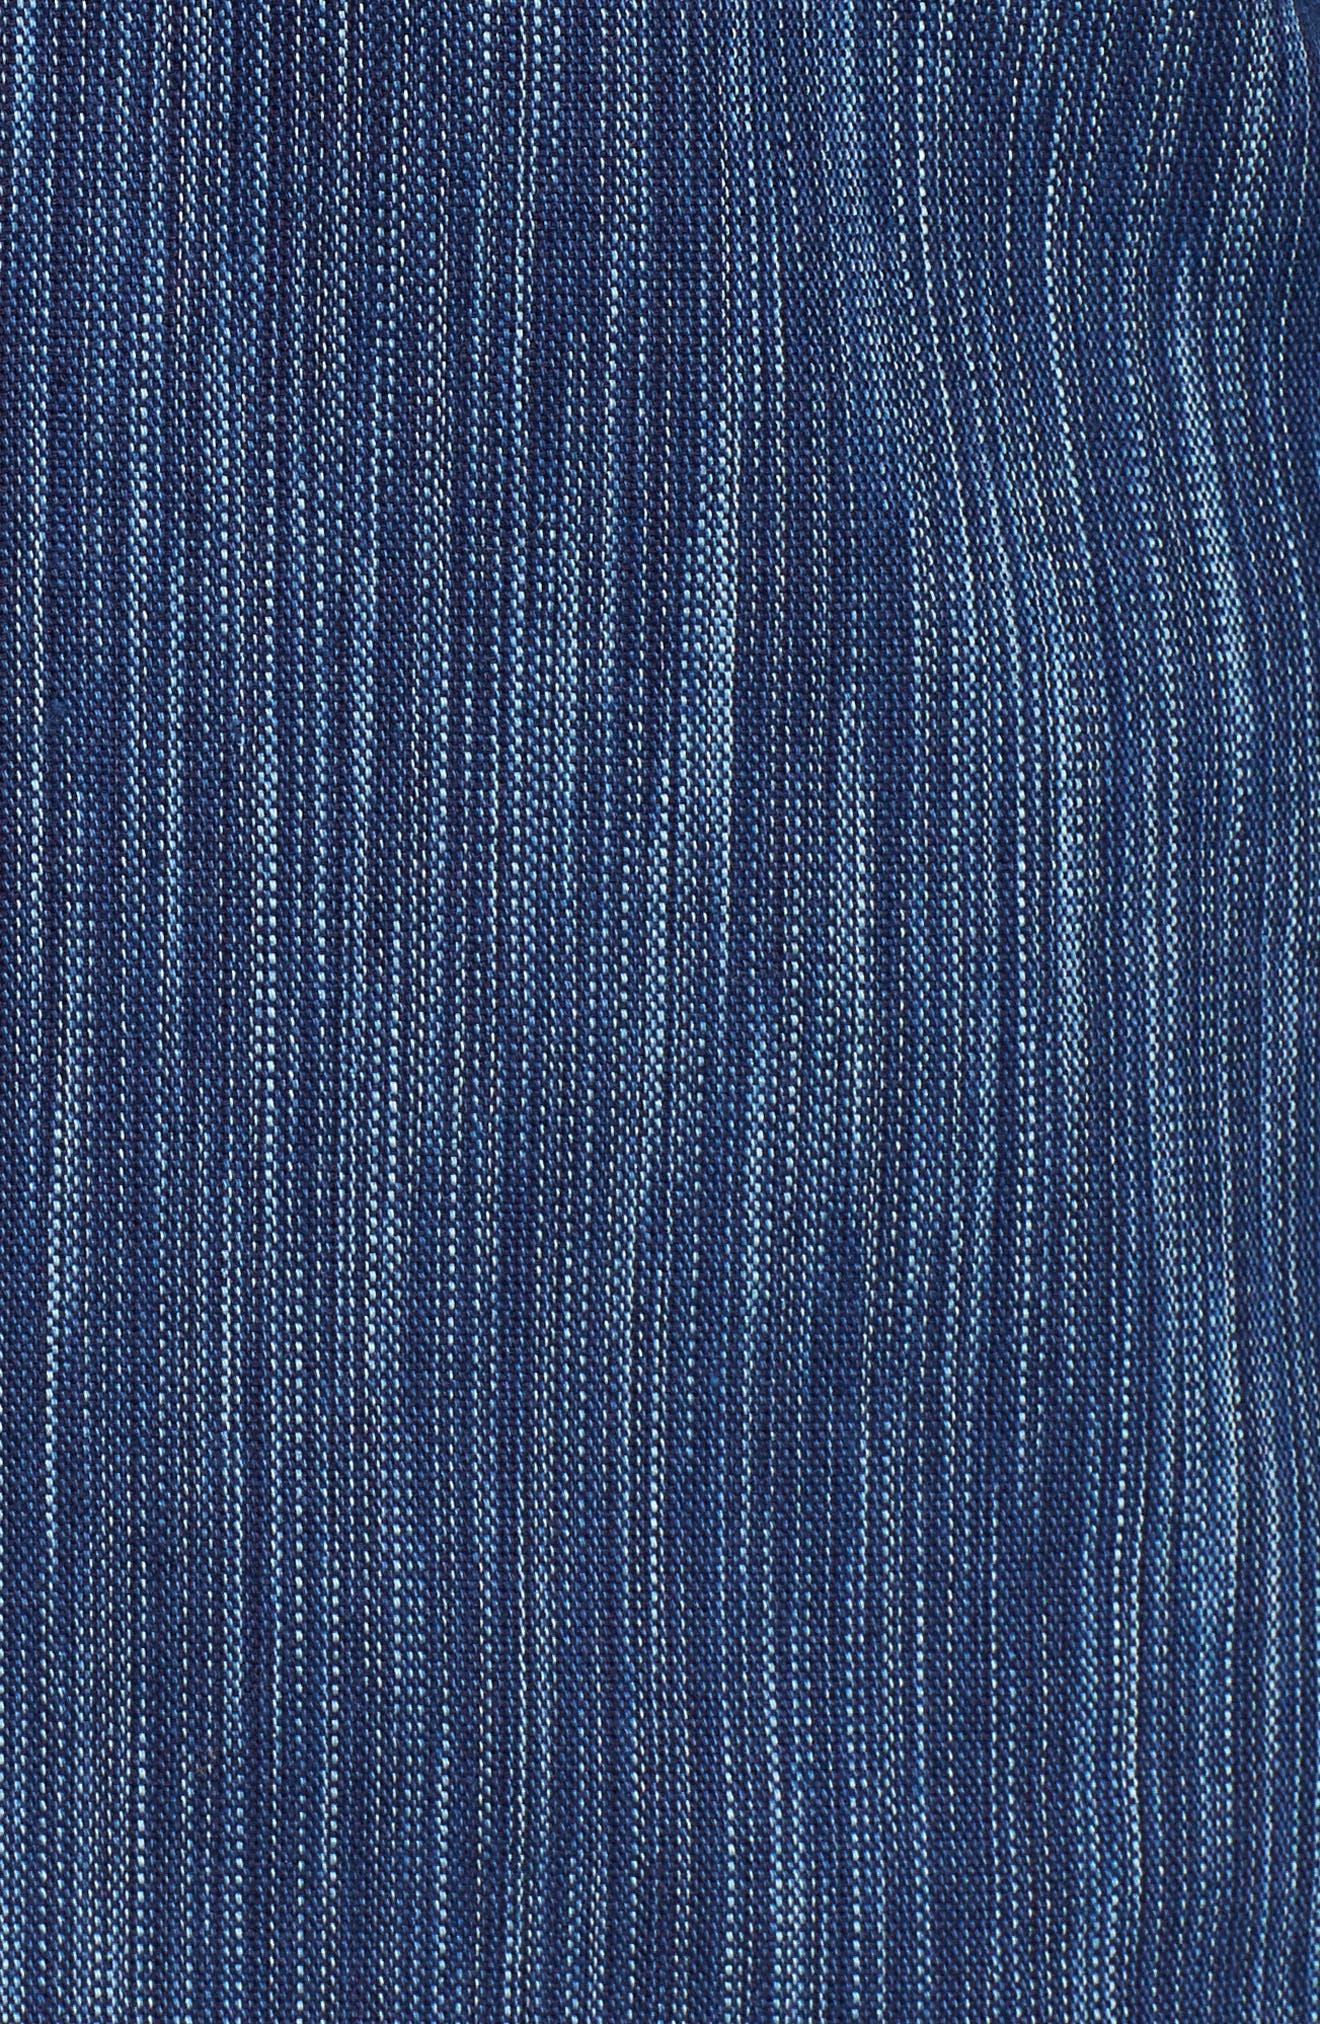 Indigo Tie Dye Rain Weave Shirt,                             Alternate thumbnail 5, color,                             401